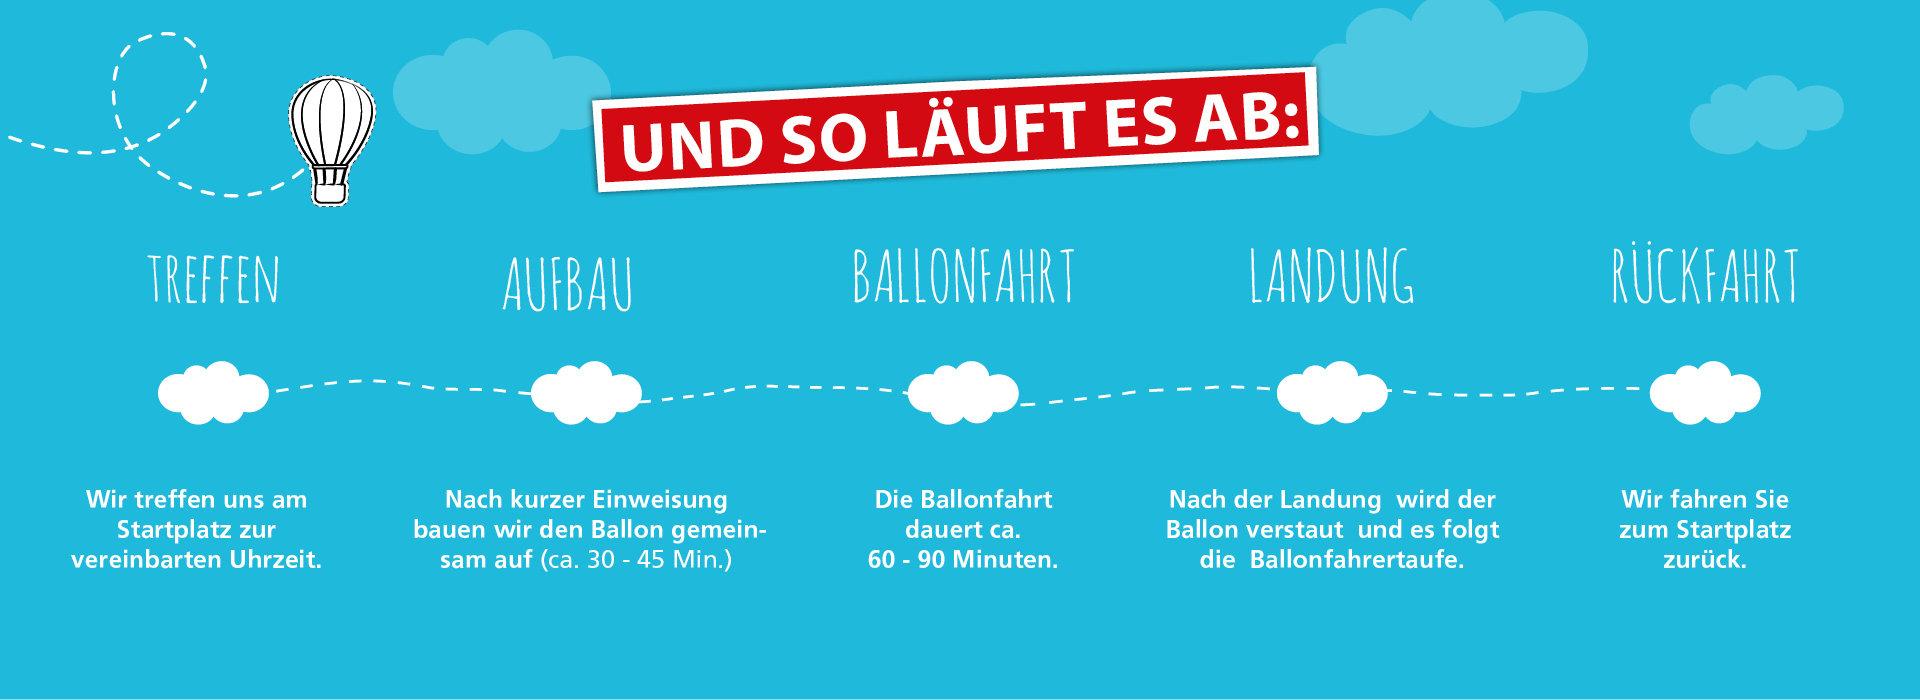 ballonfahrt ablauf